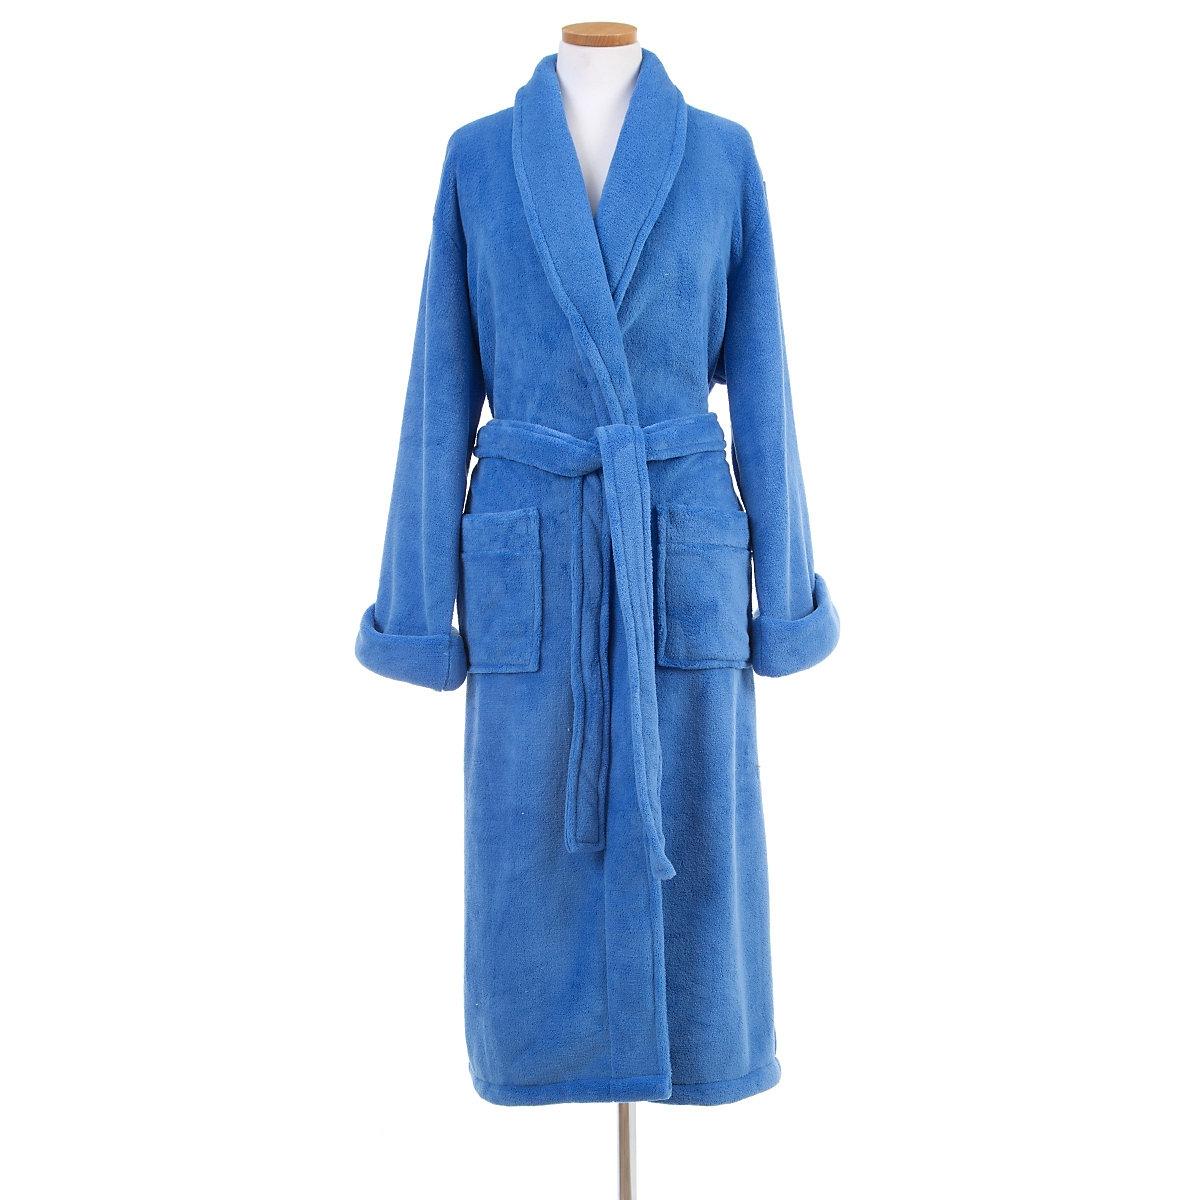 Sheepy Fleece French Blue Robe Pine Cone Hill